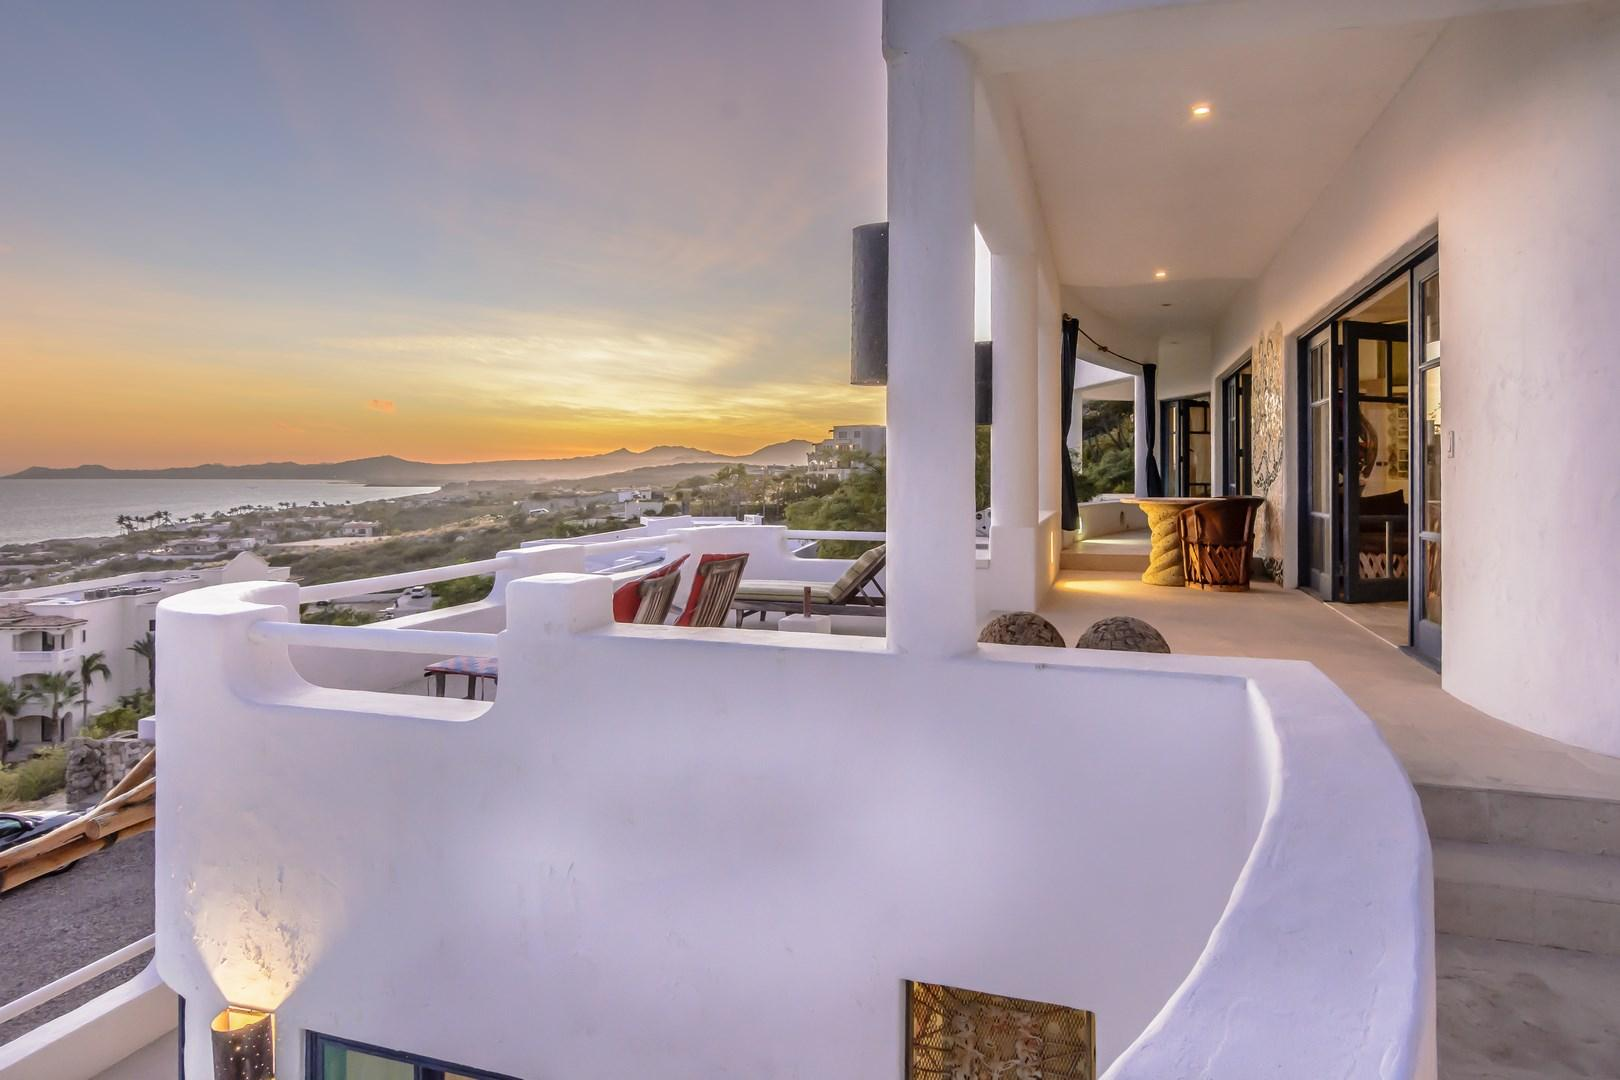 Casa Laguna Linda terrace